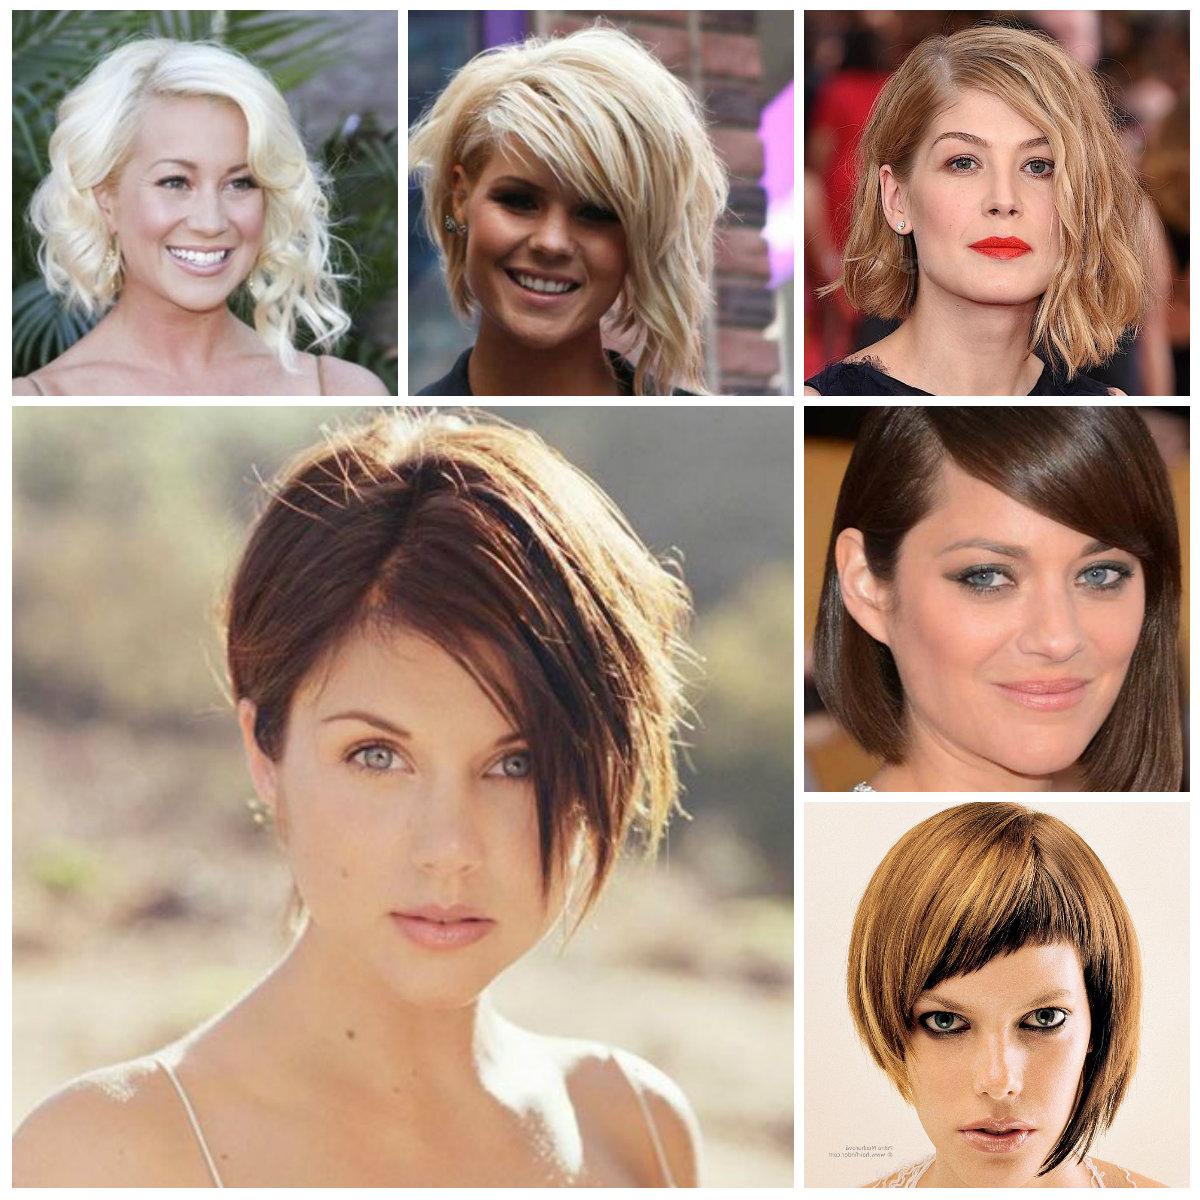 Edgy Asymmetrical Bob Haircuts For 2016 | 2019 Haircuts, Hairstyles Regarding Edgy Asymmetrical Short Haircuts (View 5 of 25)